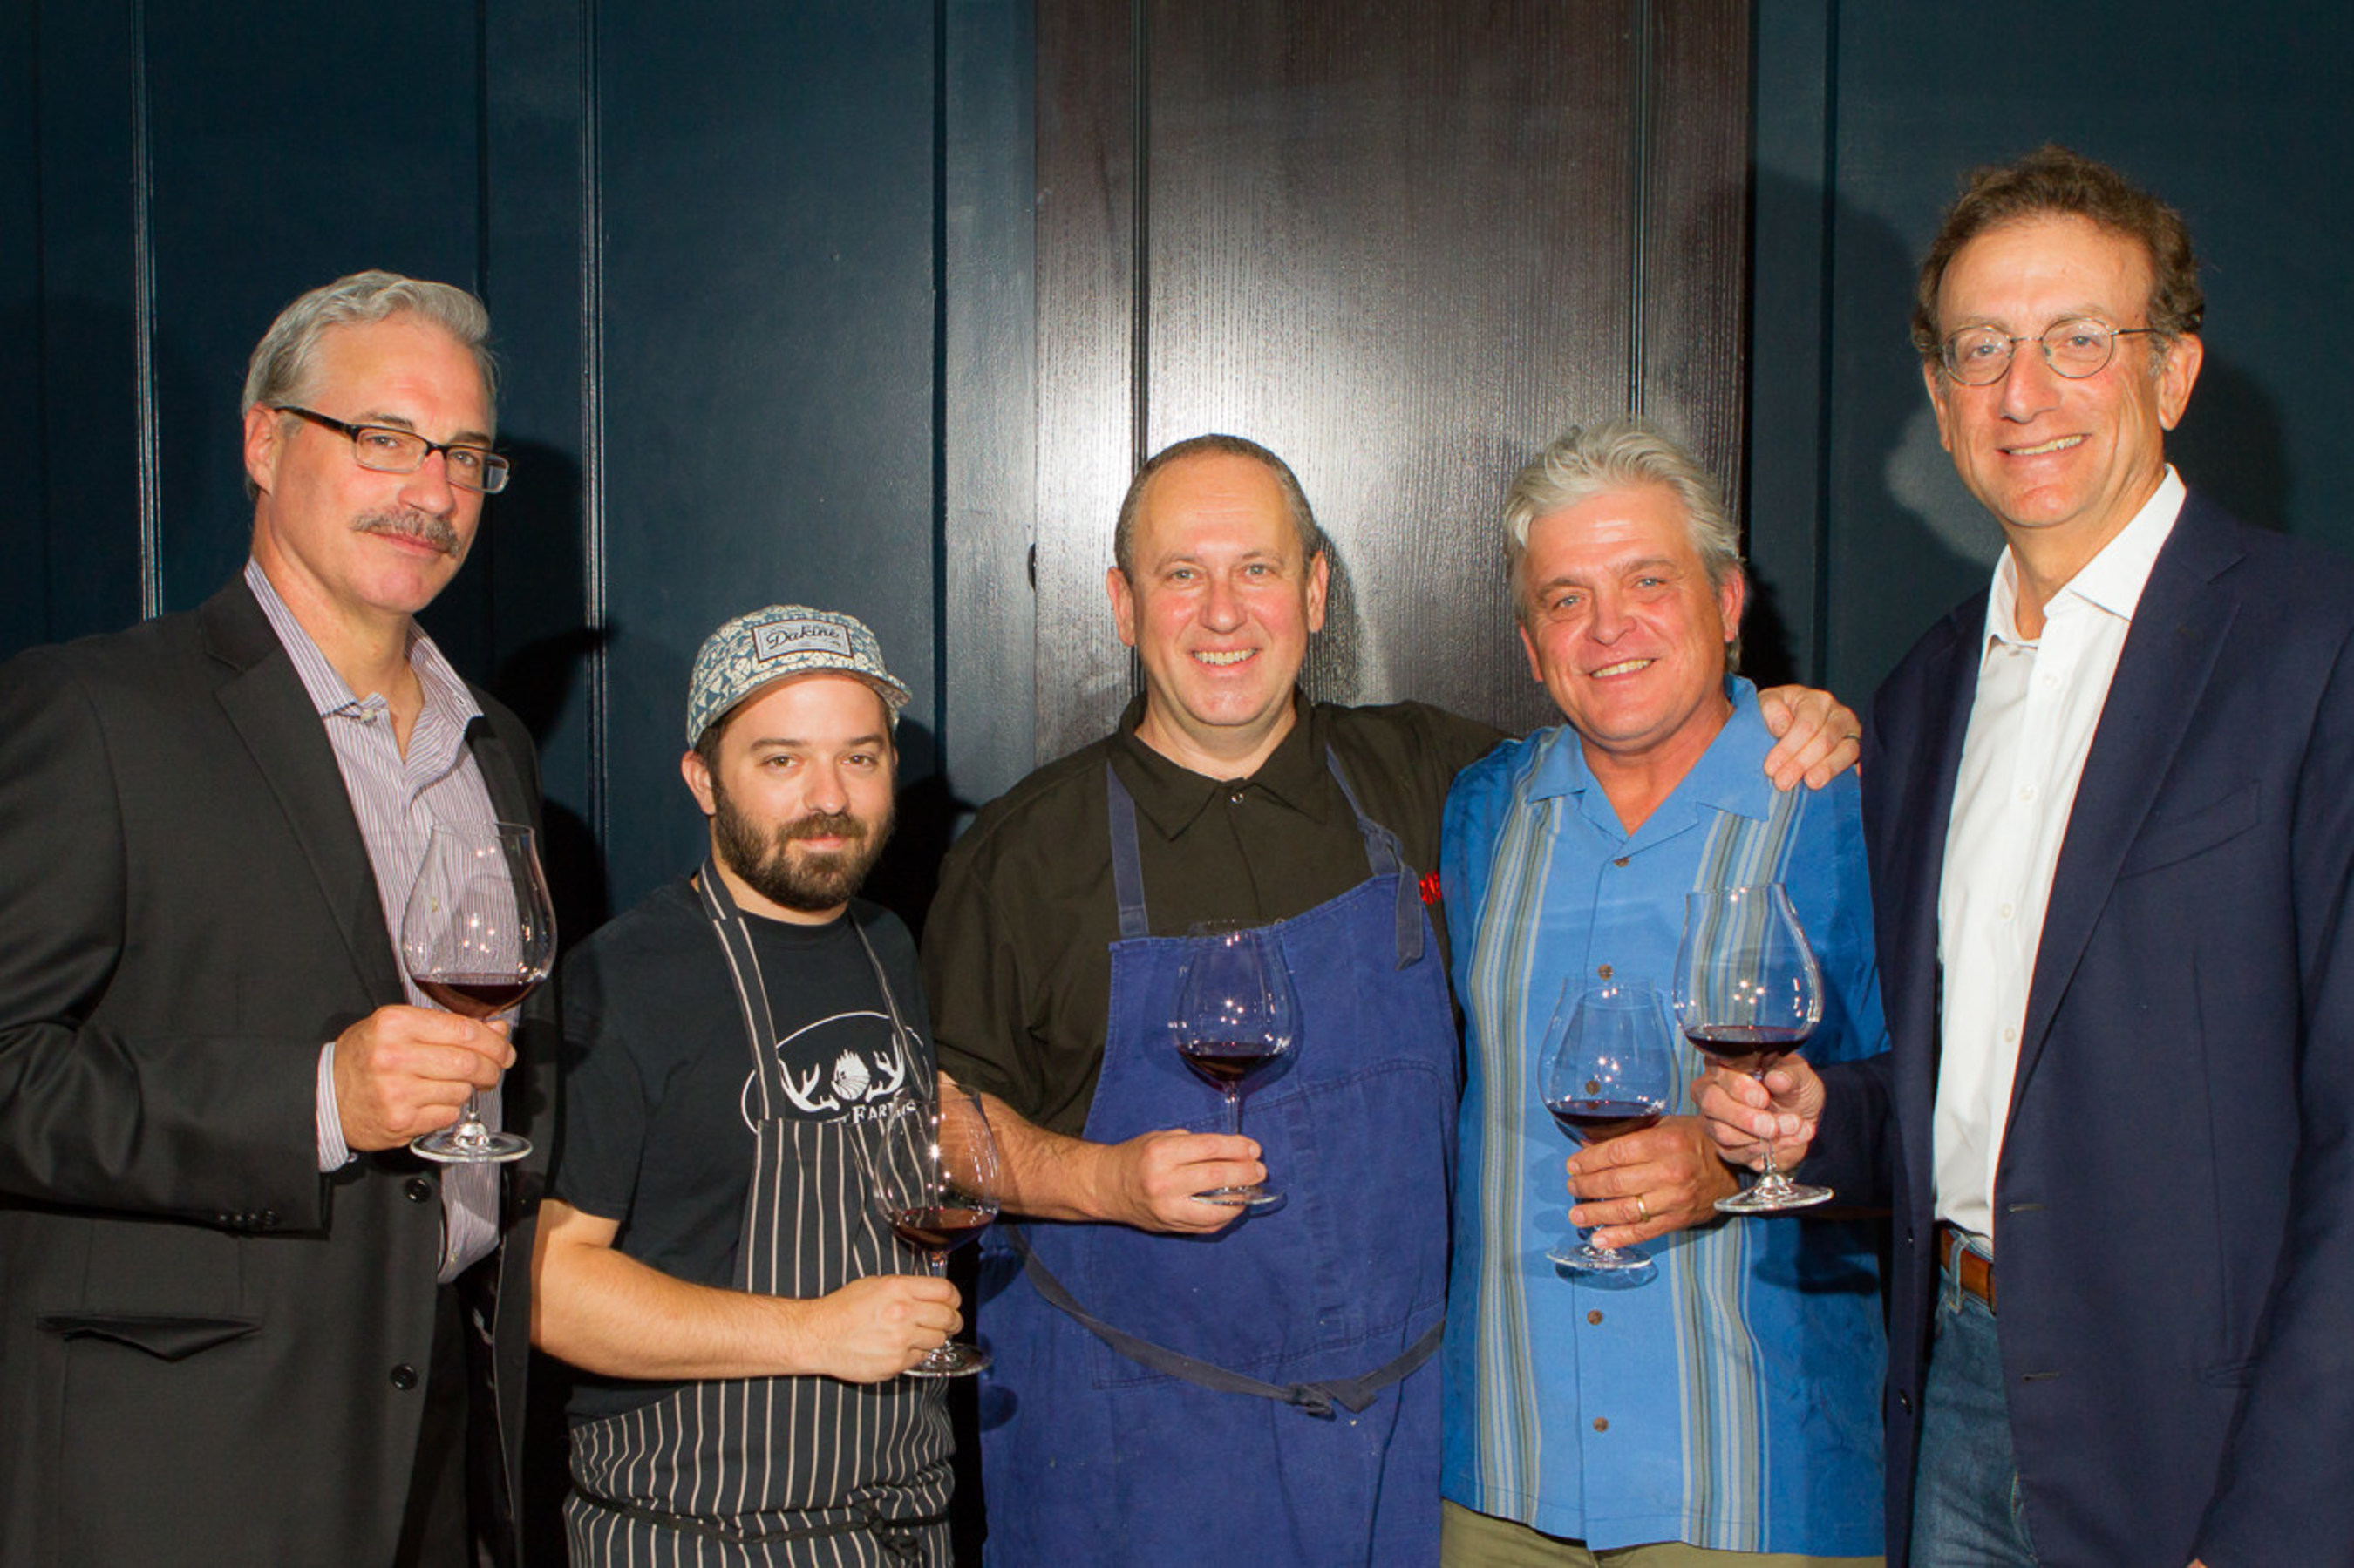 (L-R) Tony Rynders Consulting Winemaker Panther Creek Cellars; Doug Adams  sc 1 st  PR Newswire & Panther Creek Cellars Debuts Portfolio of Tony Ryndersu0027 Single ...